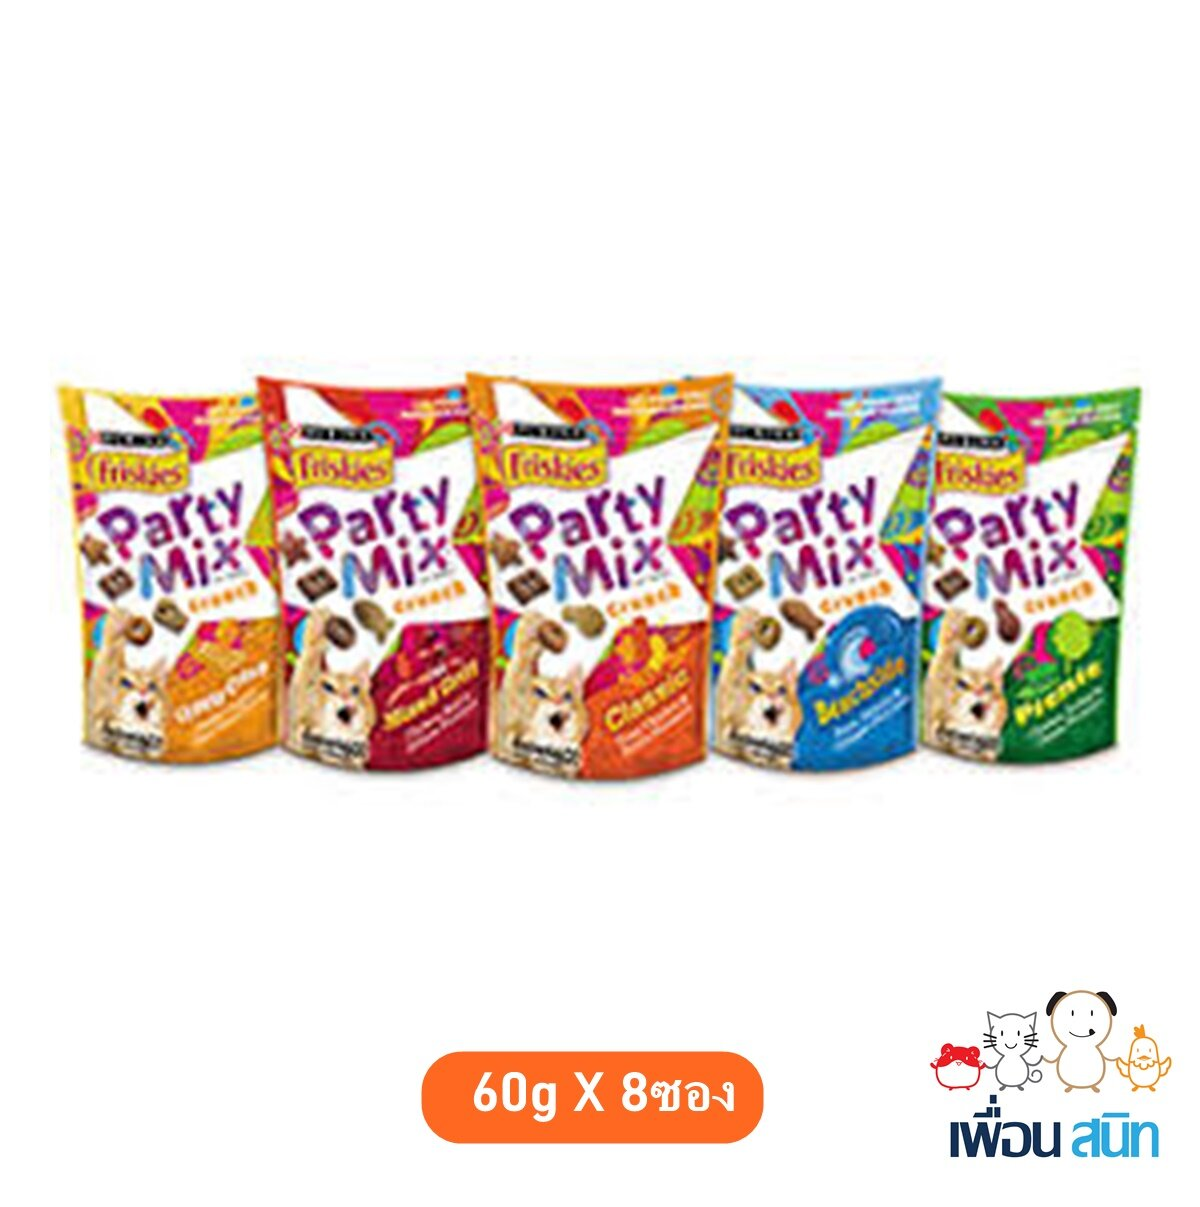 Friskies Party Mix ขนมแมว คละรส 60g X 8units (เลือกรสชาติได้).